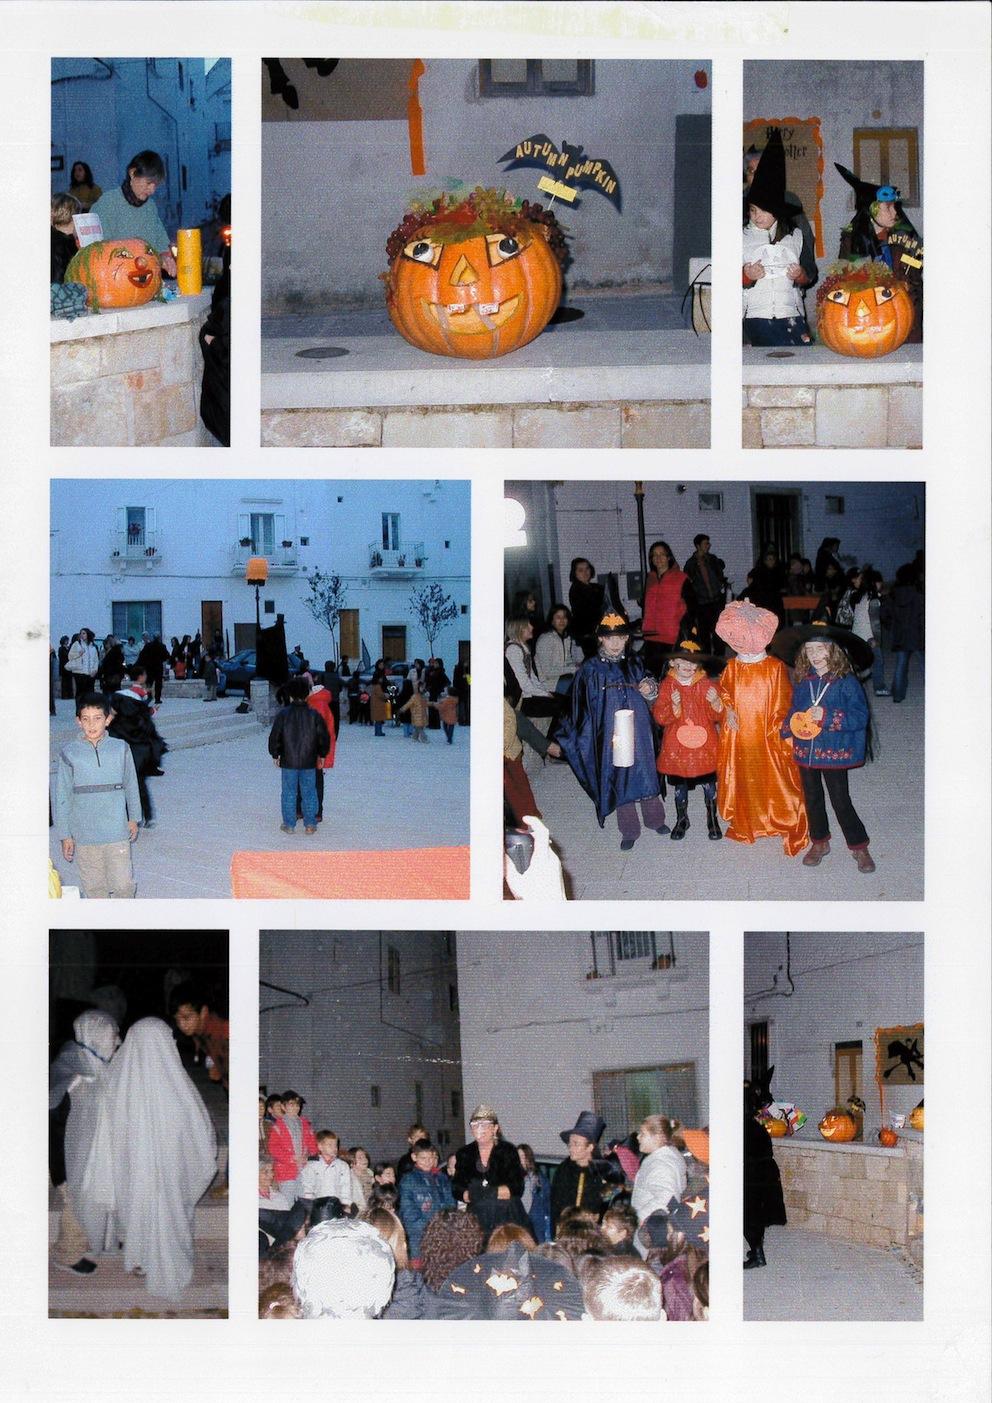 20031031_Halloween_01